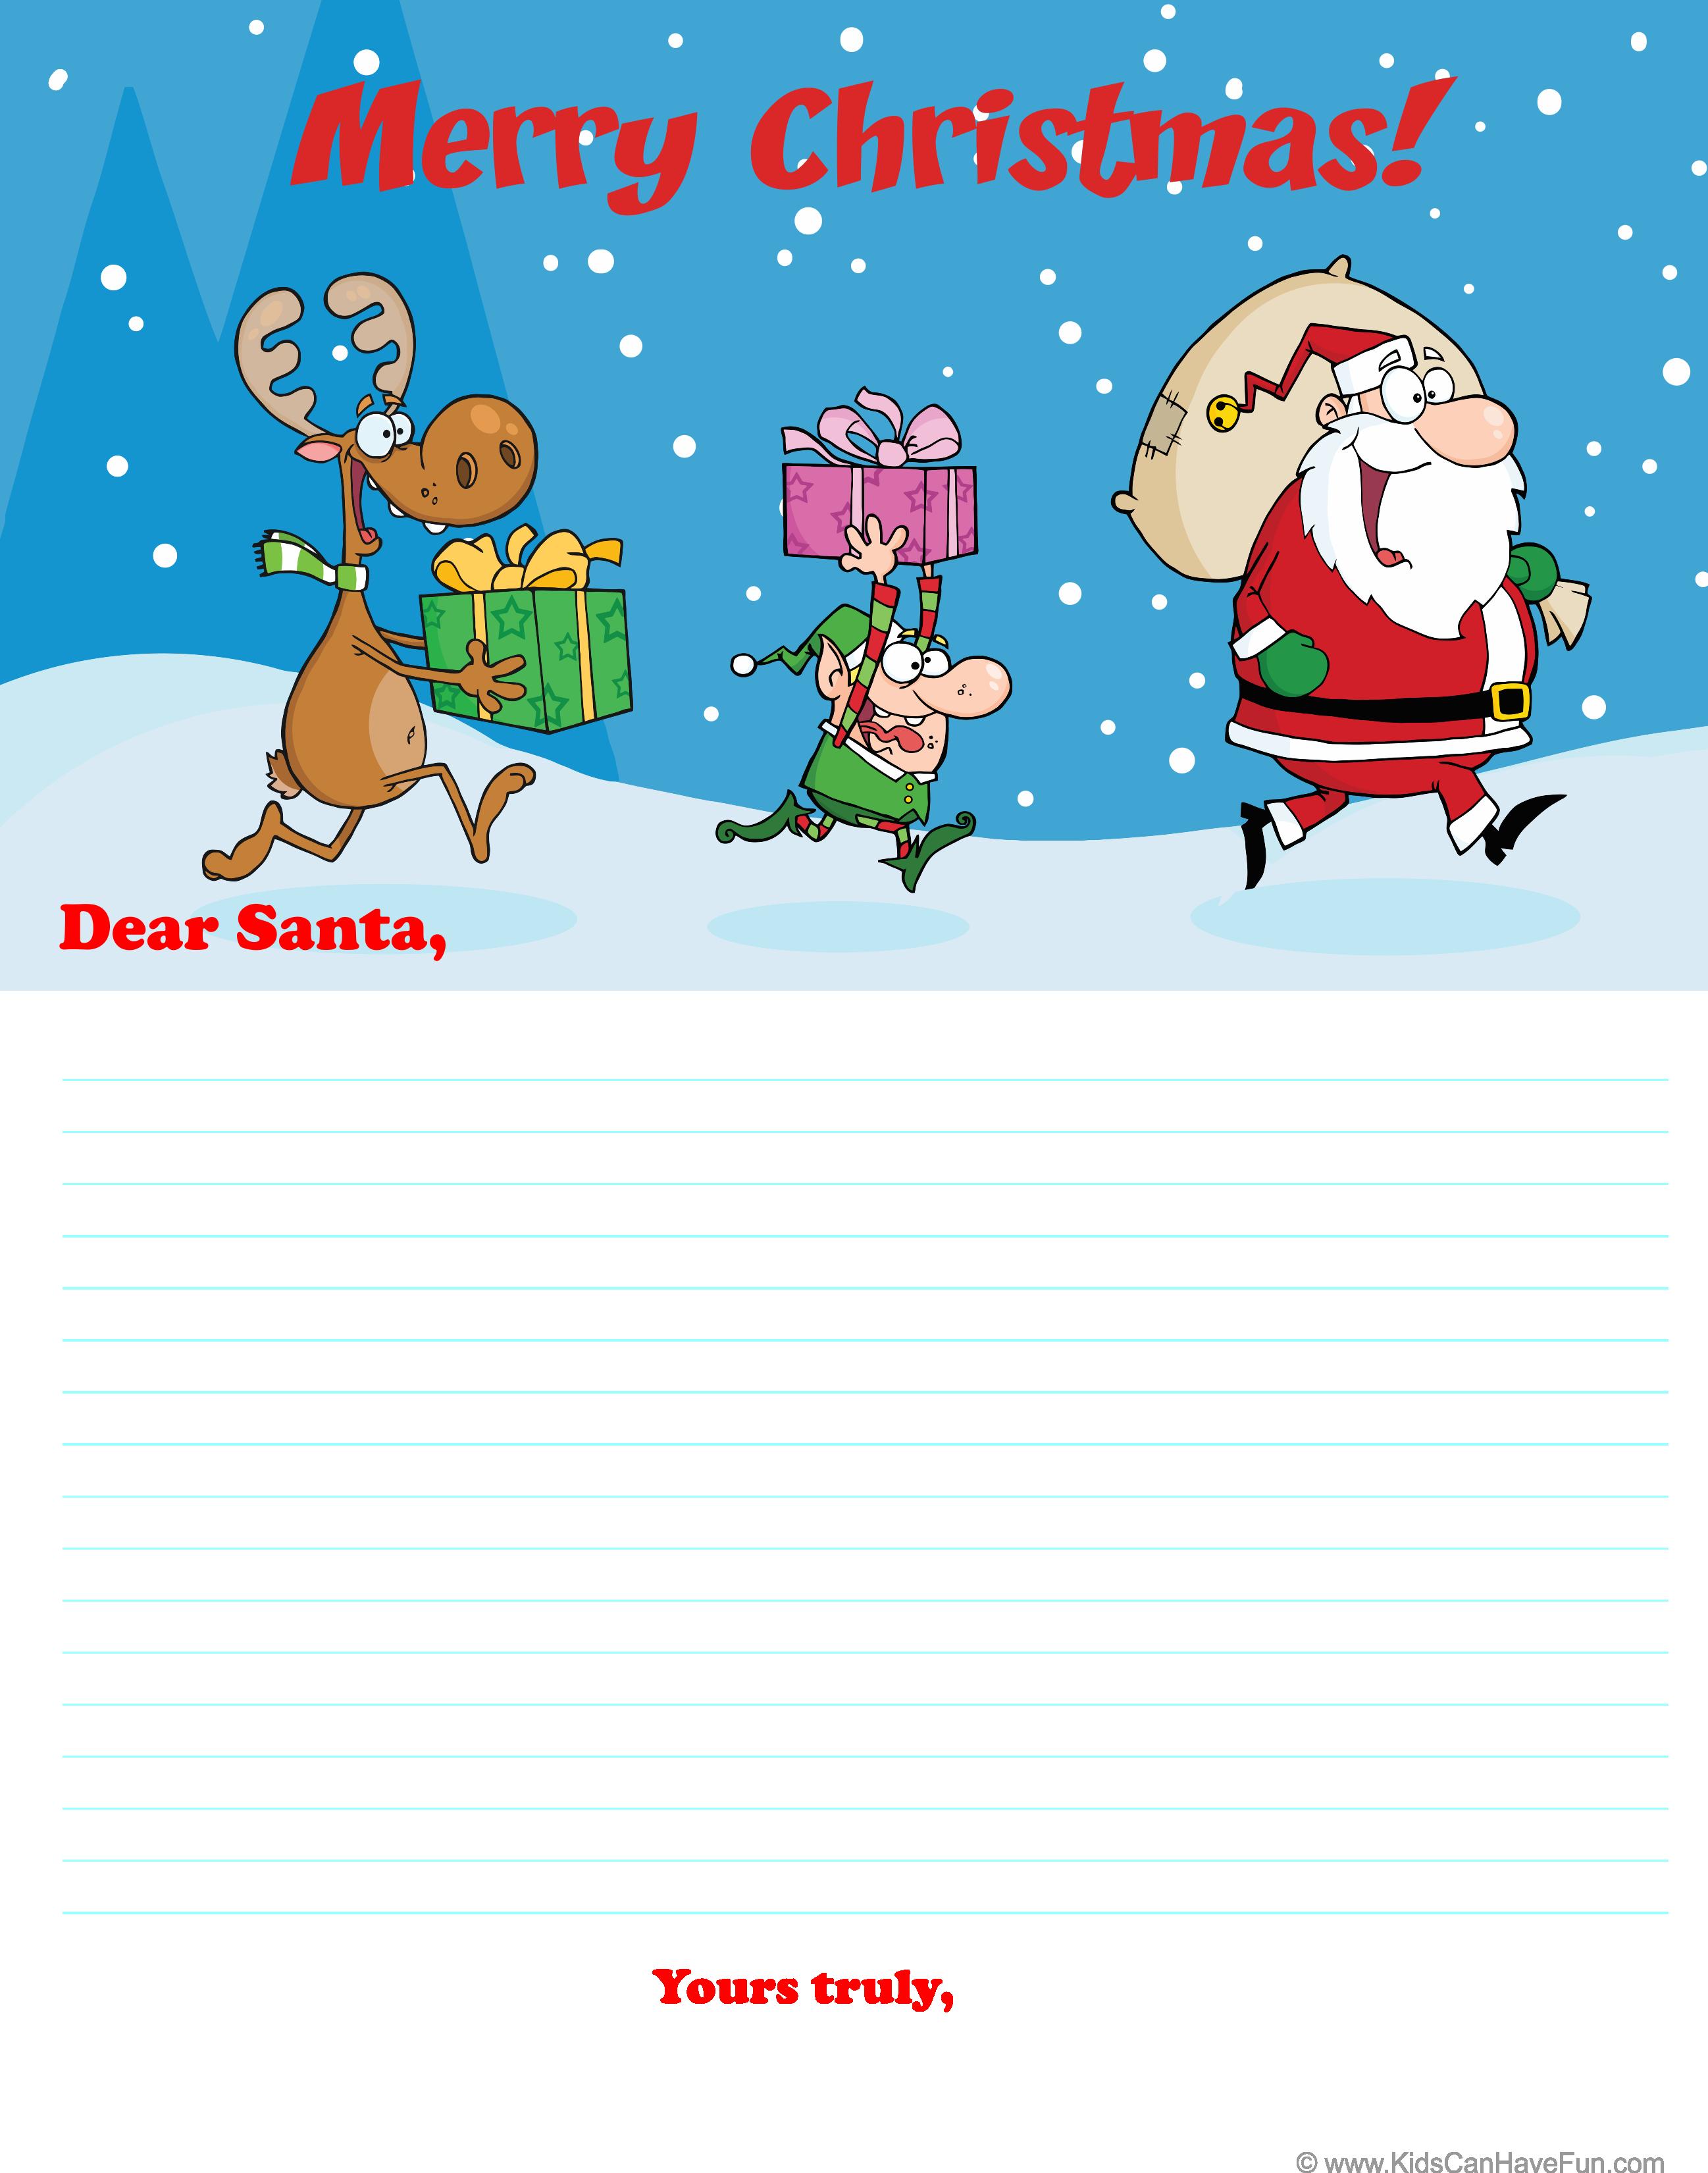 Dear Santa Letter With Reindeer